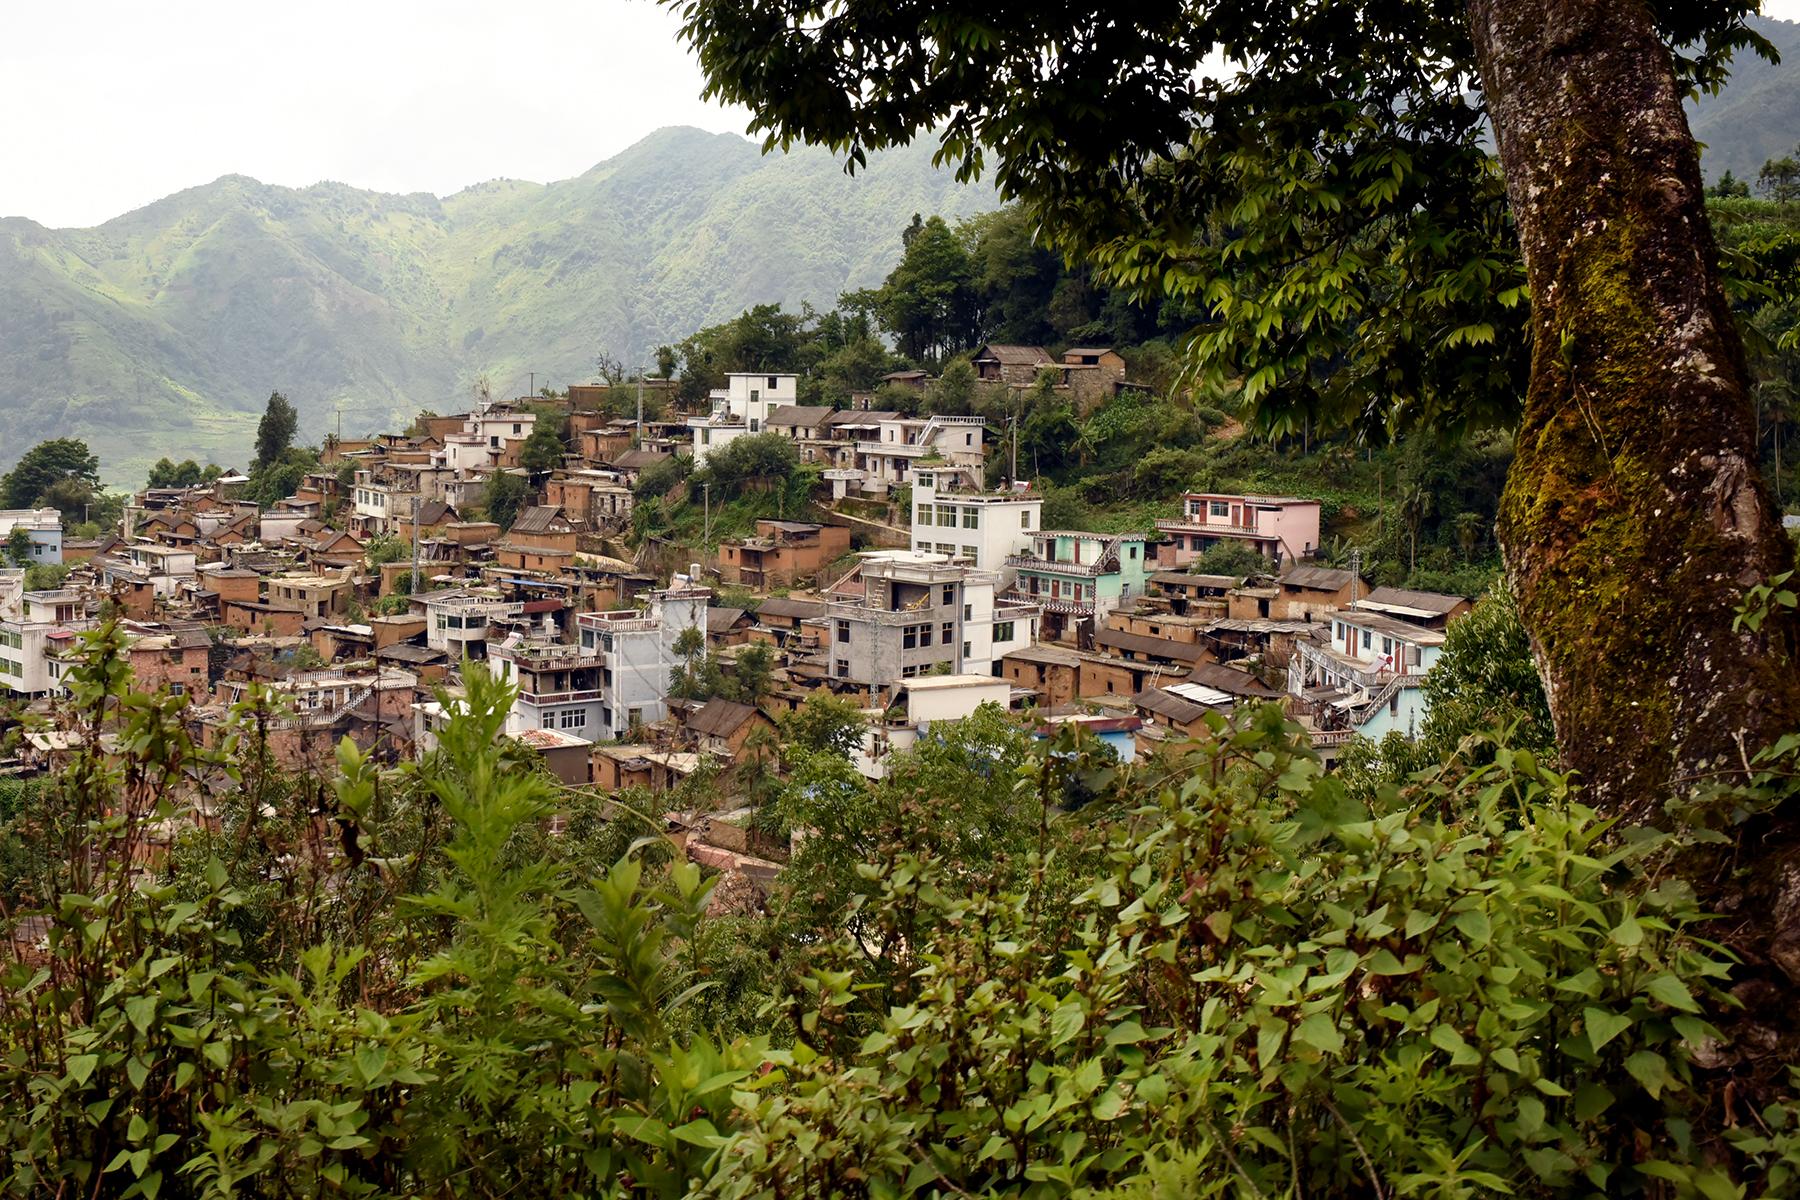 Luomo village